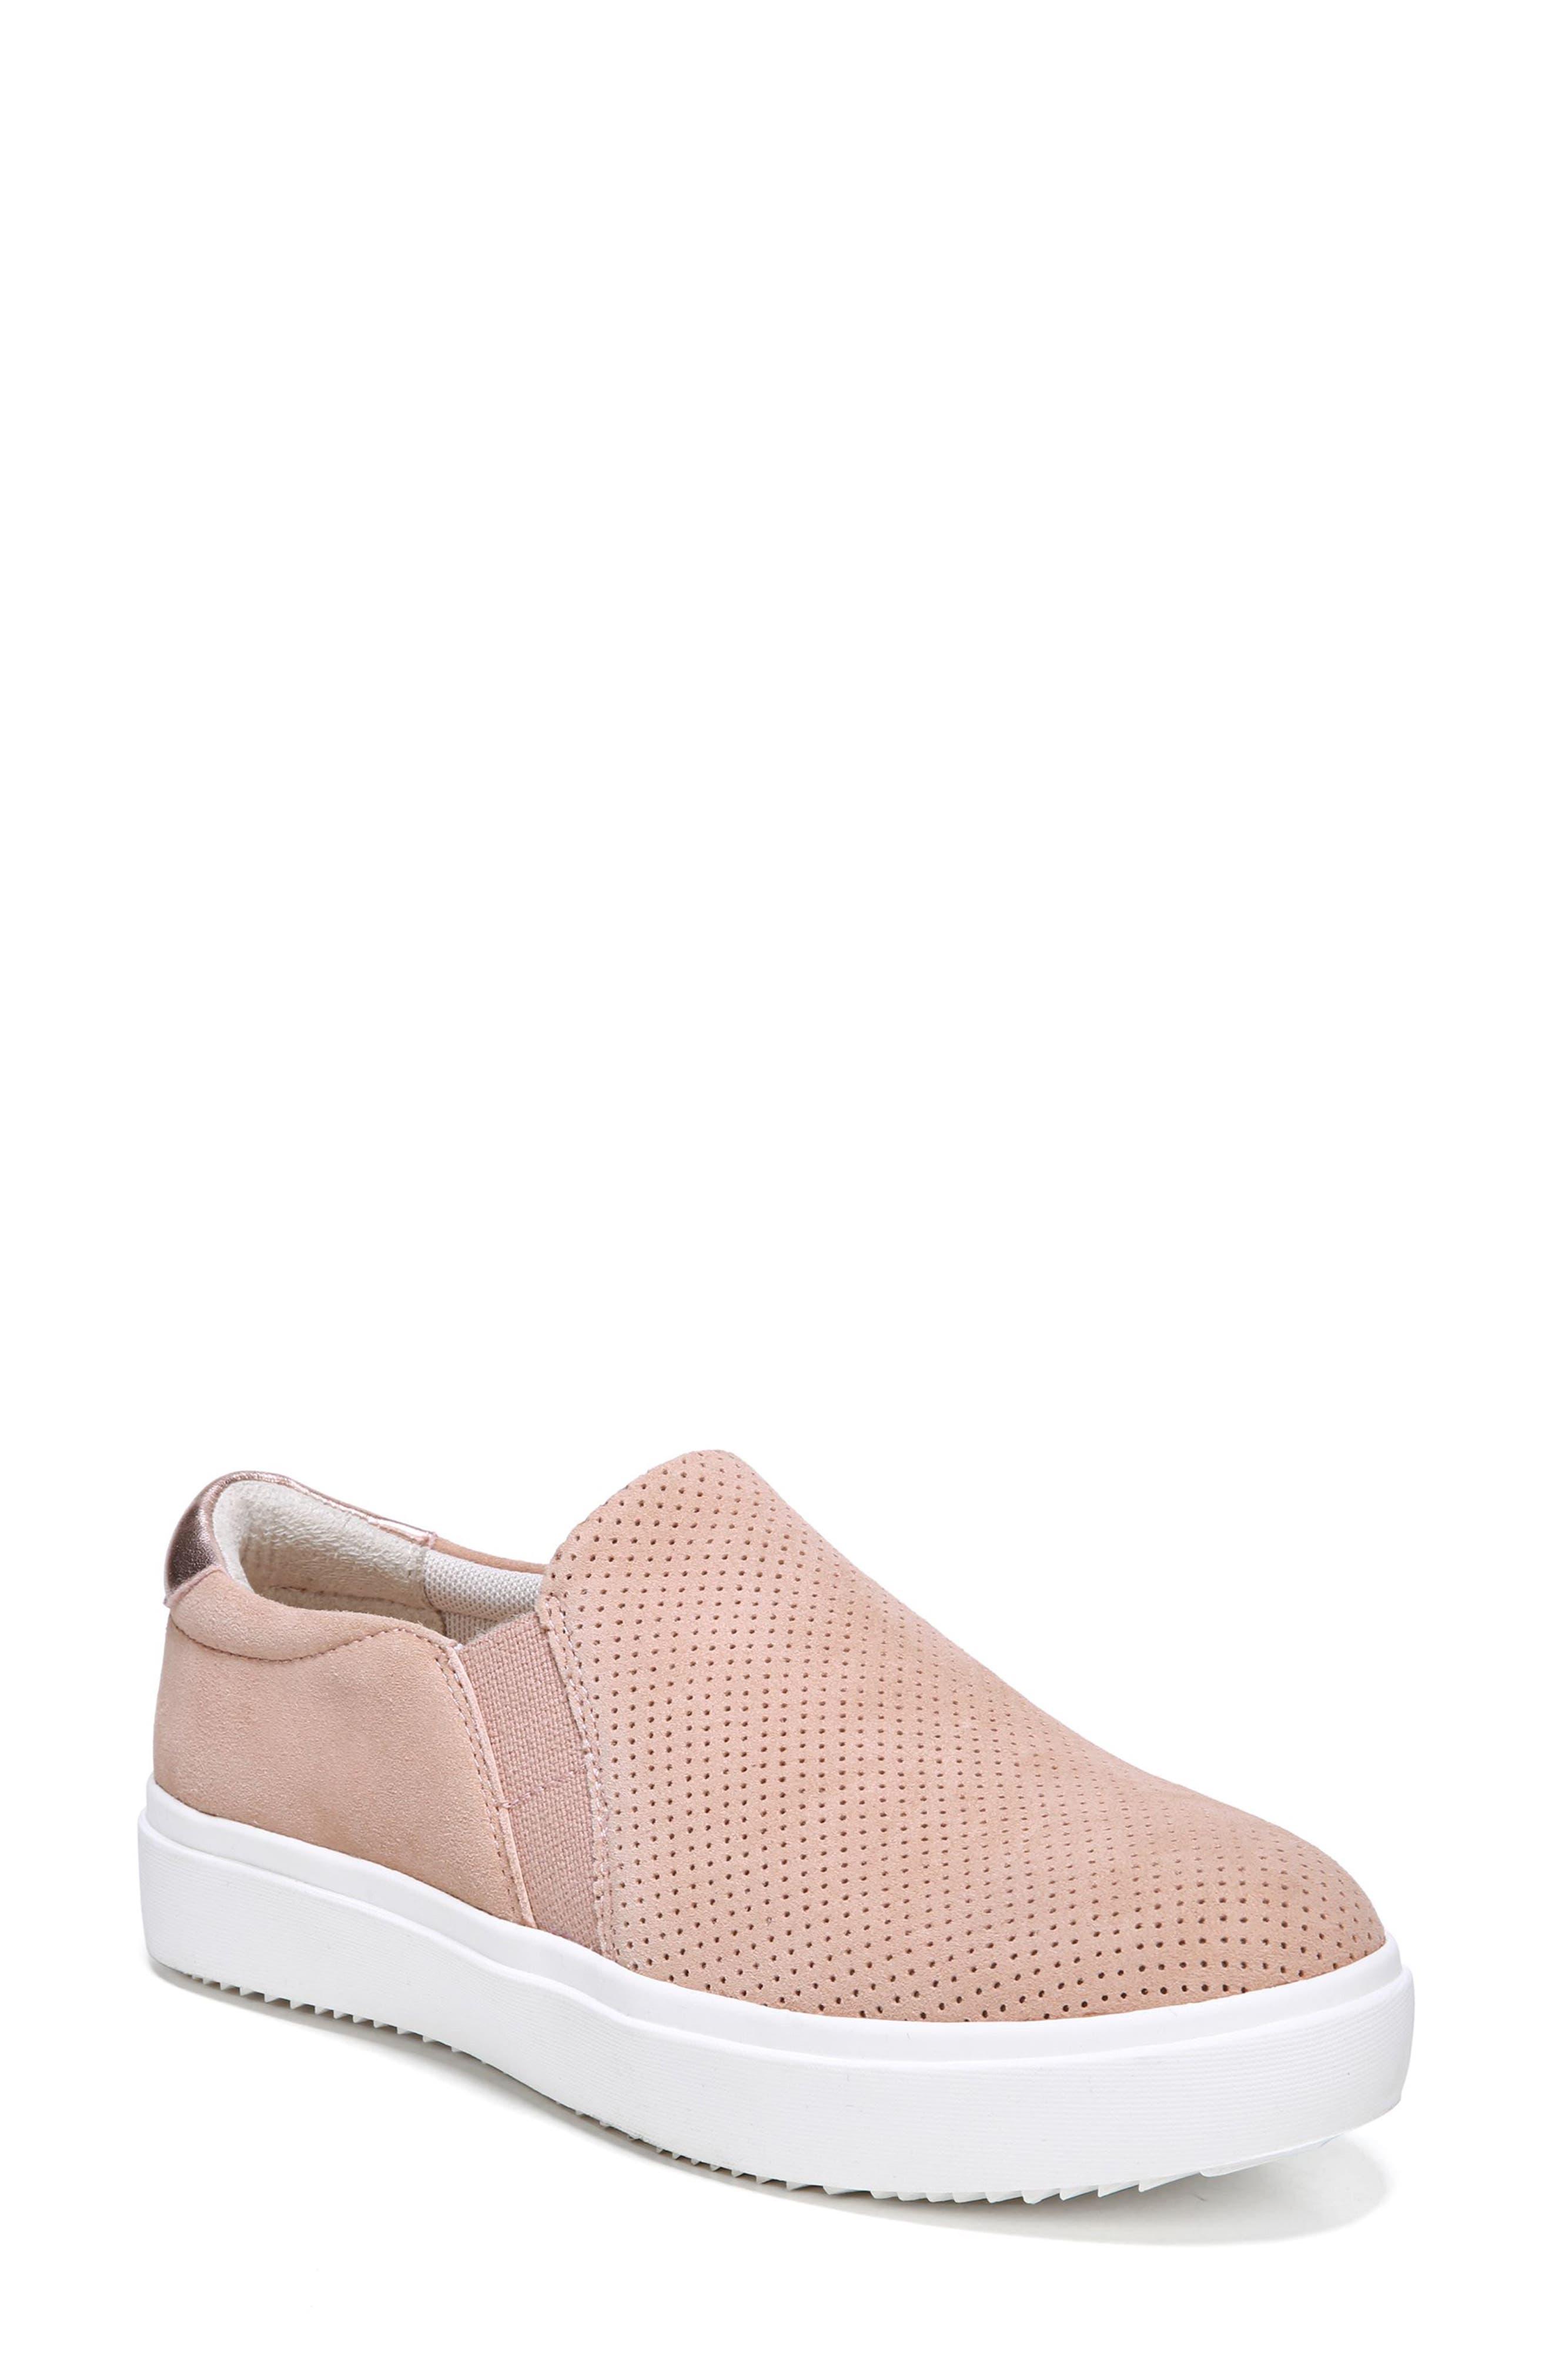 Dr. Scholl's Leta Slip-On Sneaker (Women)